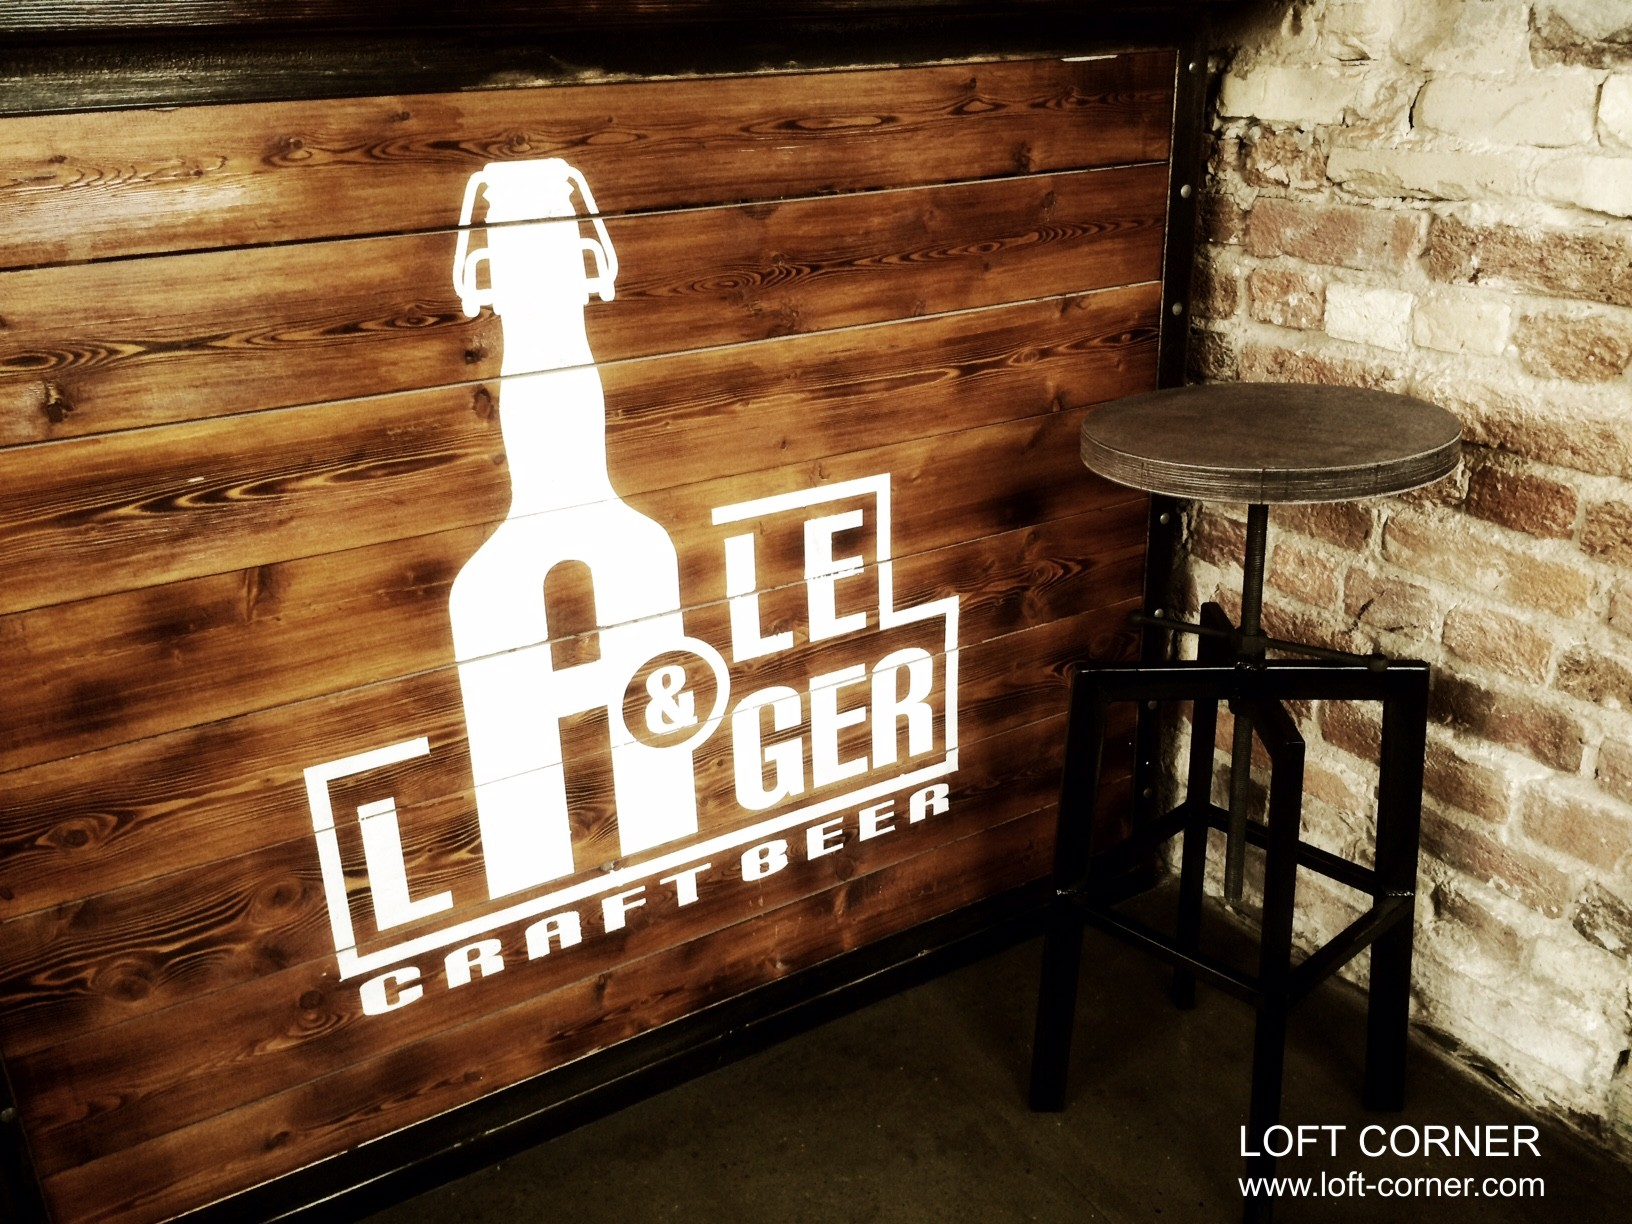 Стул лофт в баре, производство мебели лофт